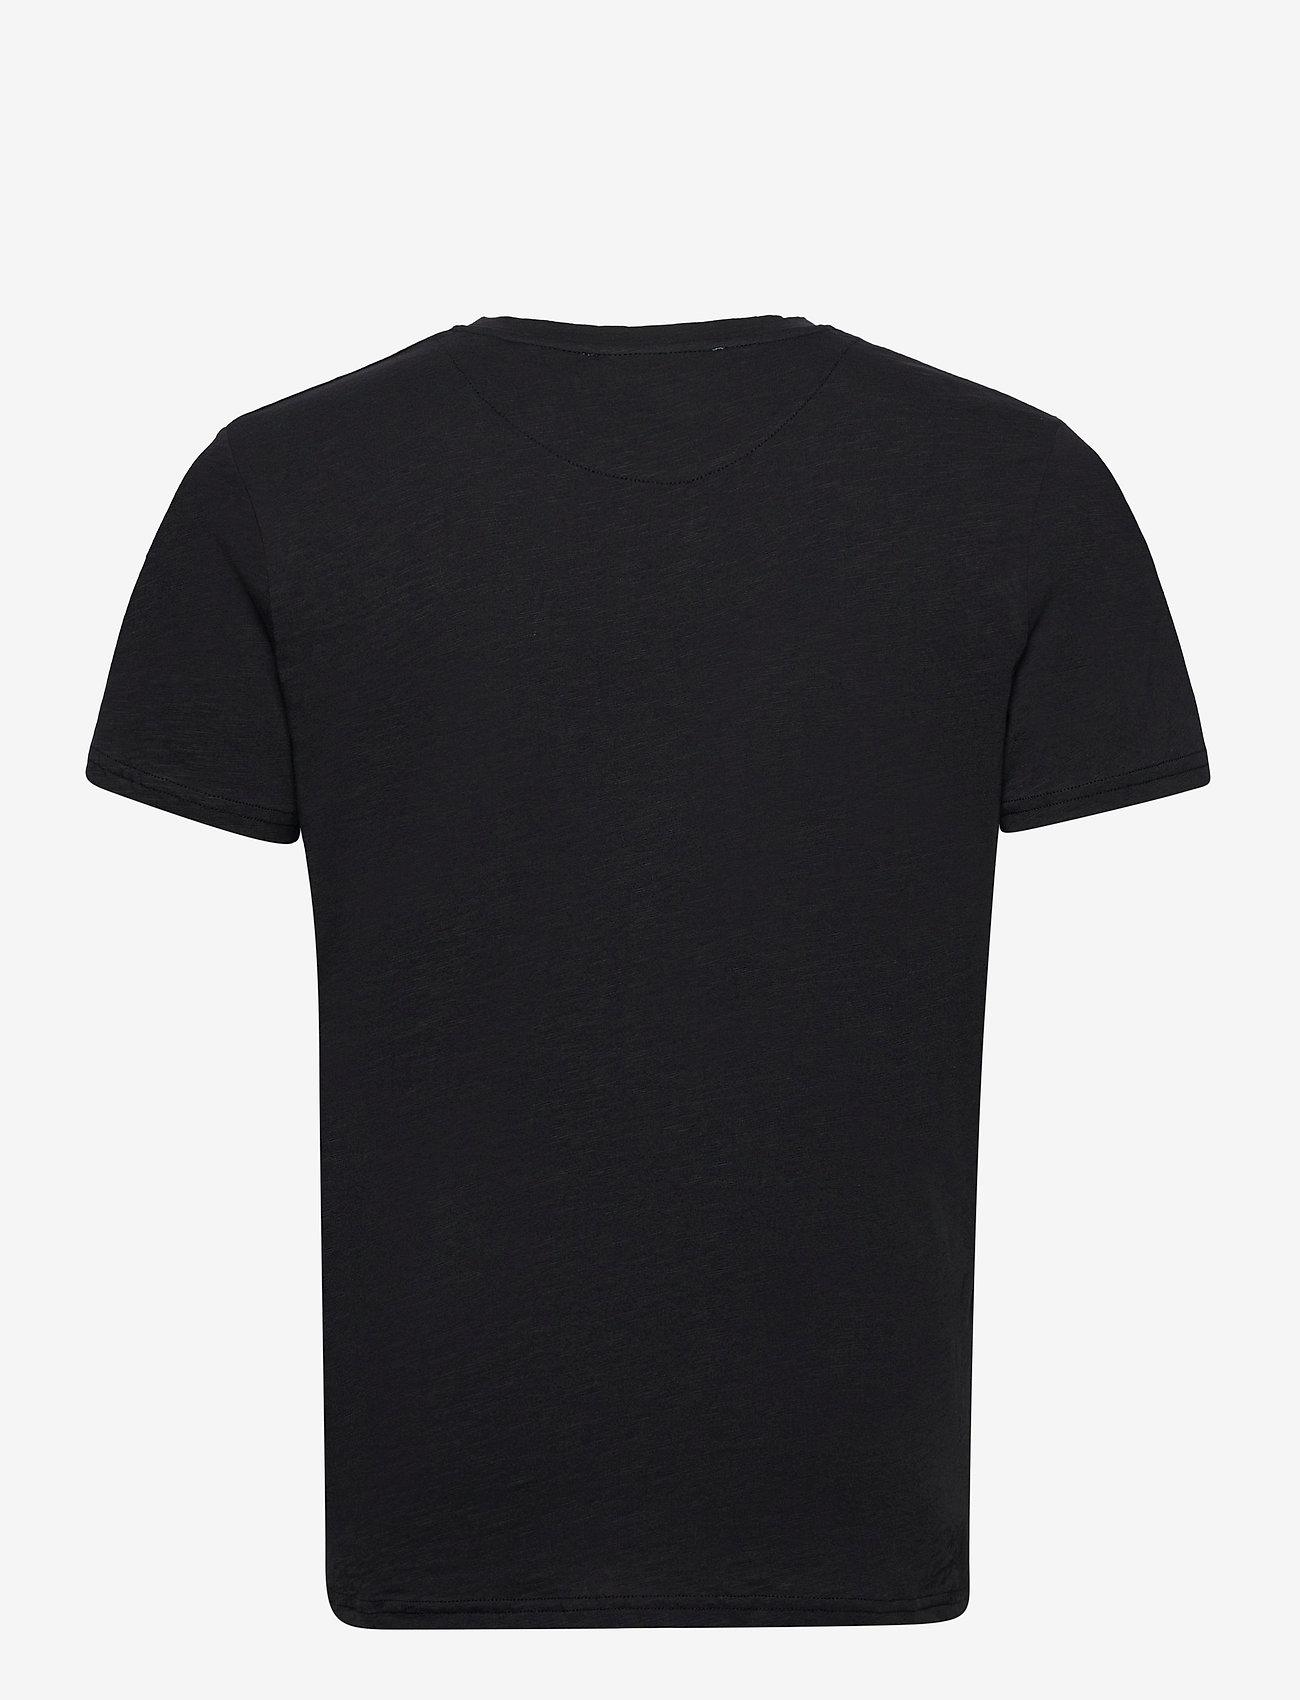 By Garment Makers - The Organic Tee w. pocket - podstawowe koszulki - jet black - 2